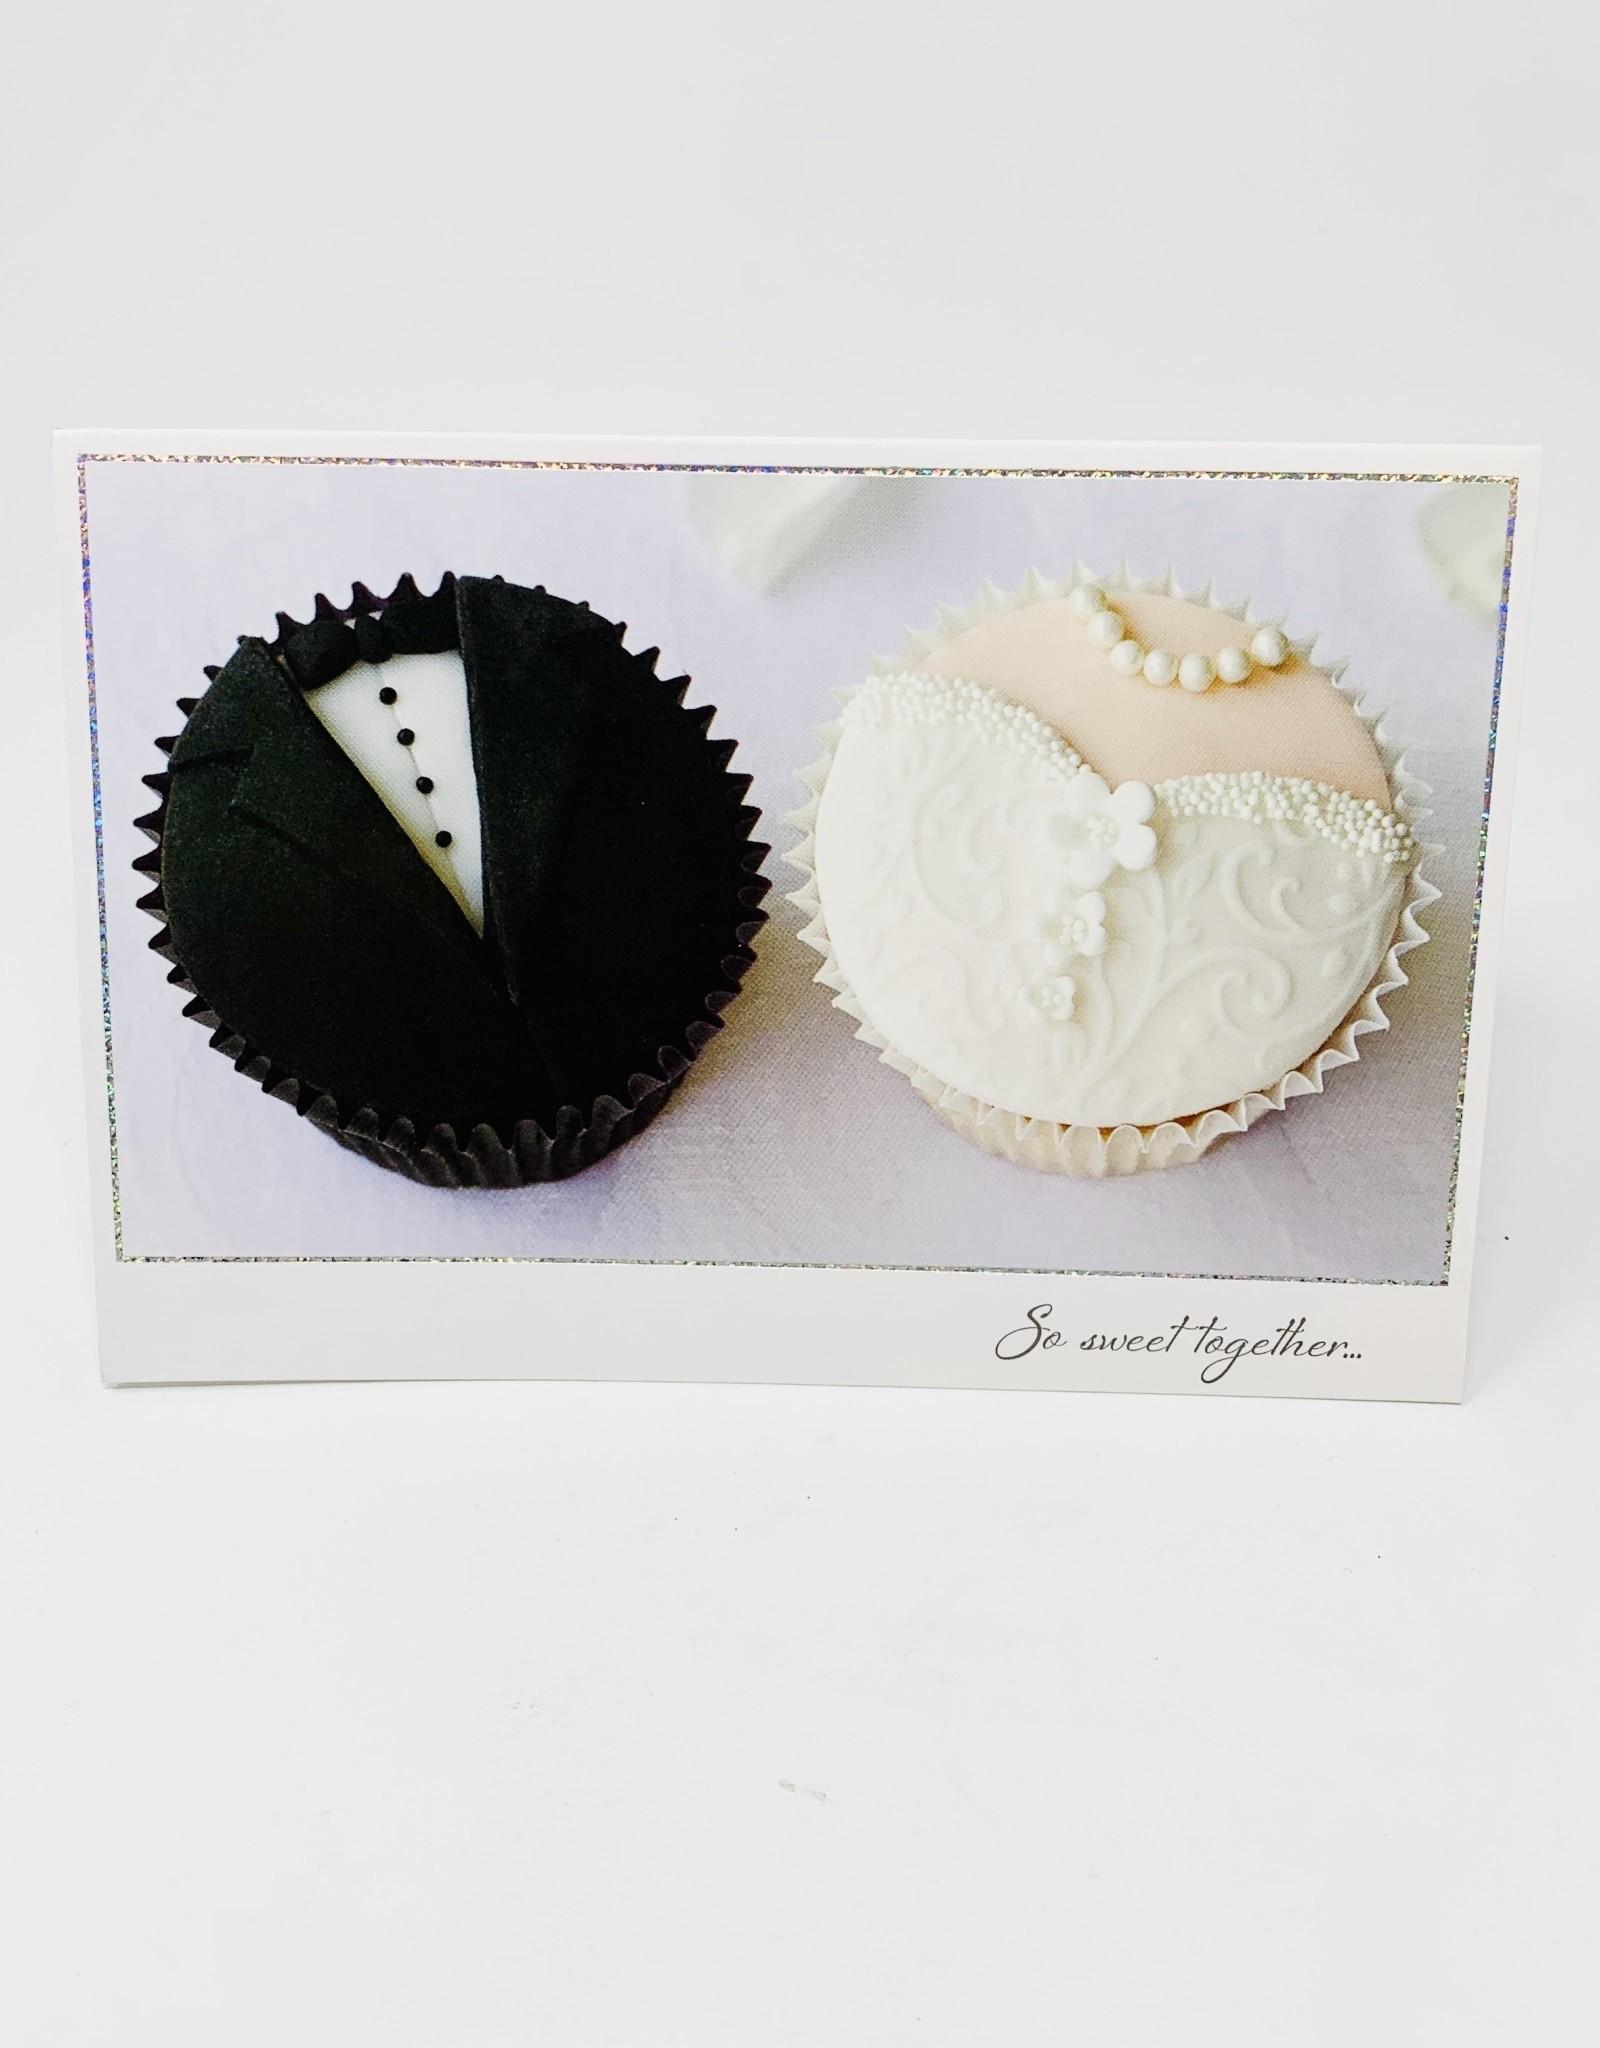 Pictura Bride/Groom Cupcakes